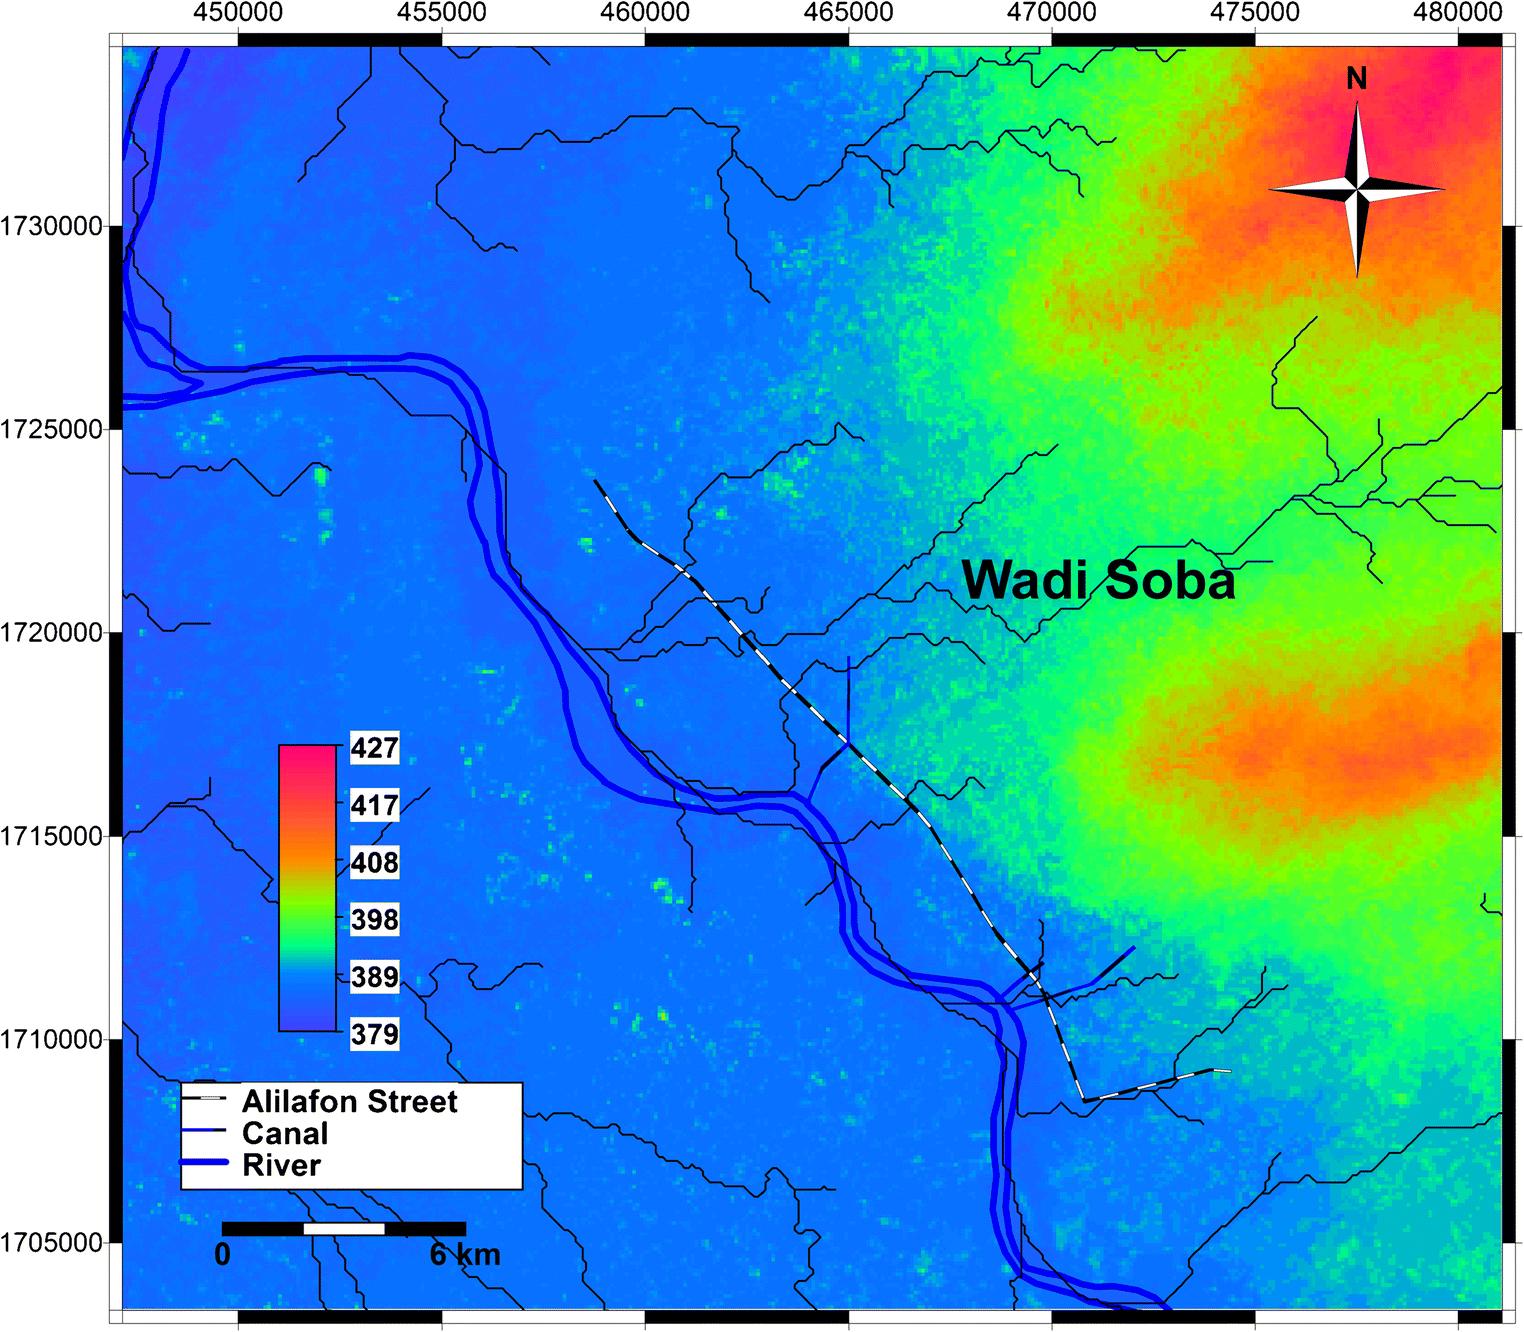 Use of NRCS-curve number method for peak discharge